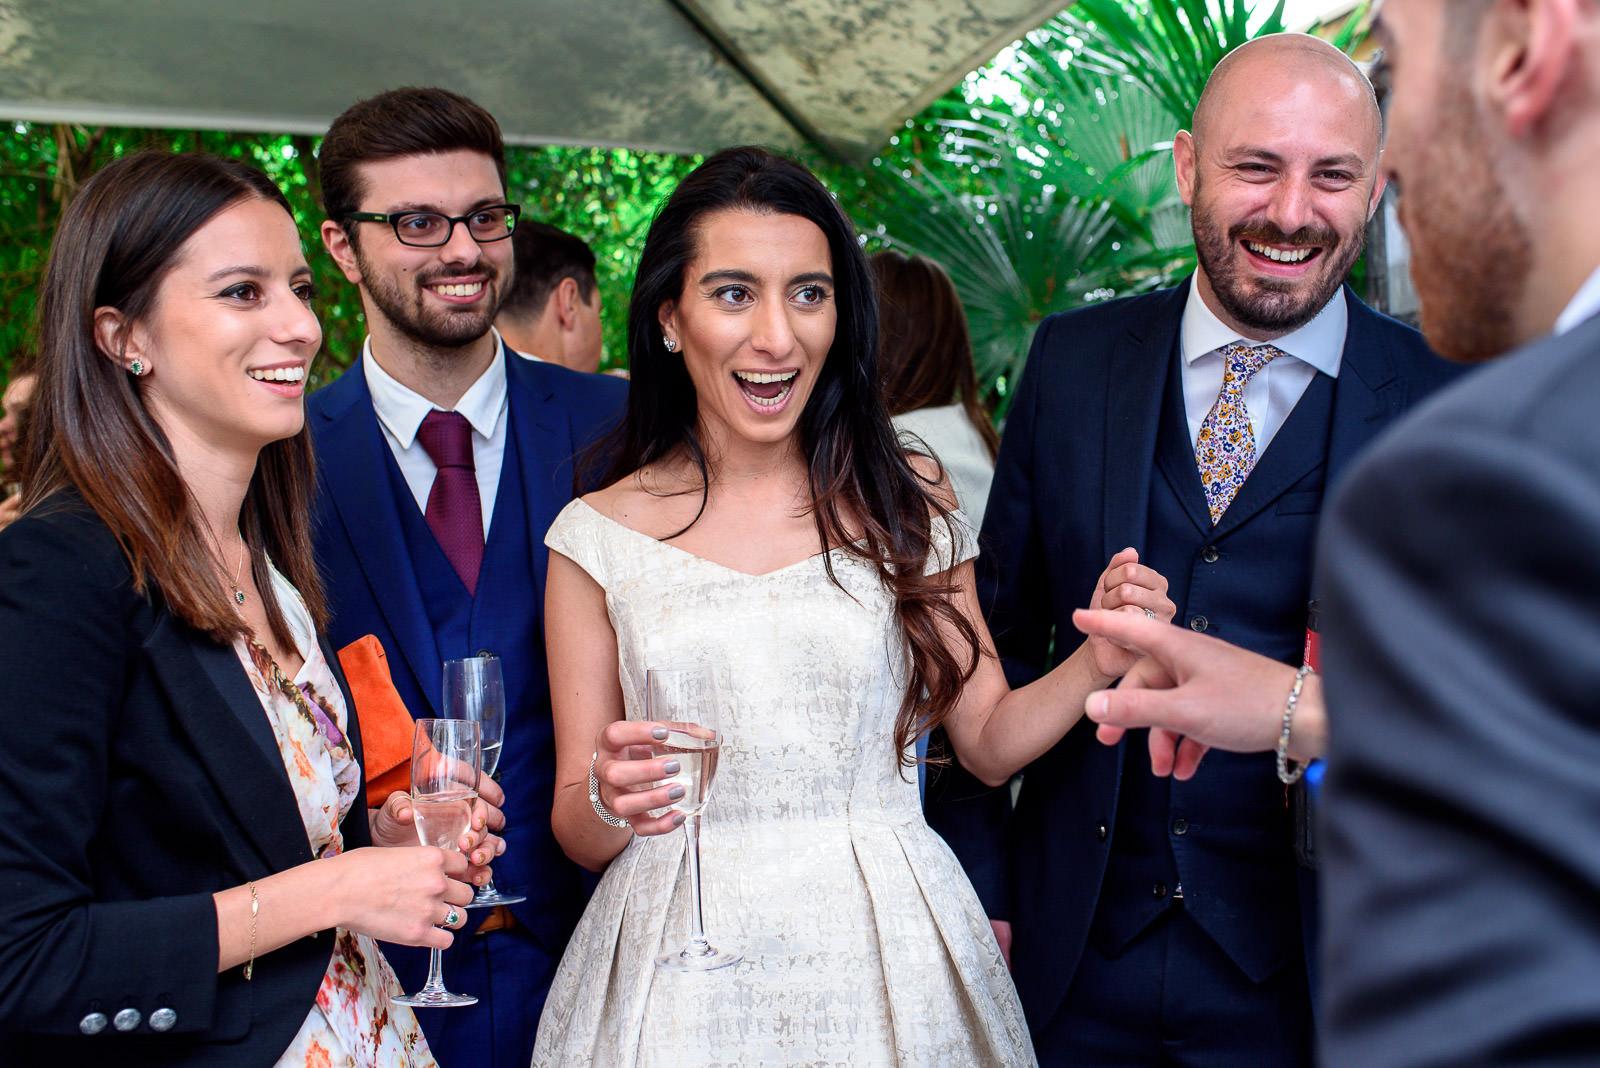 Comic book themeed wedding